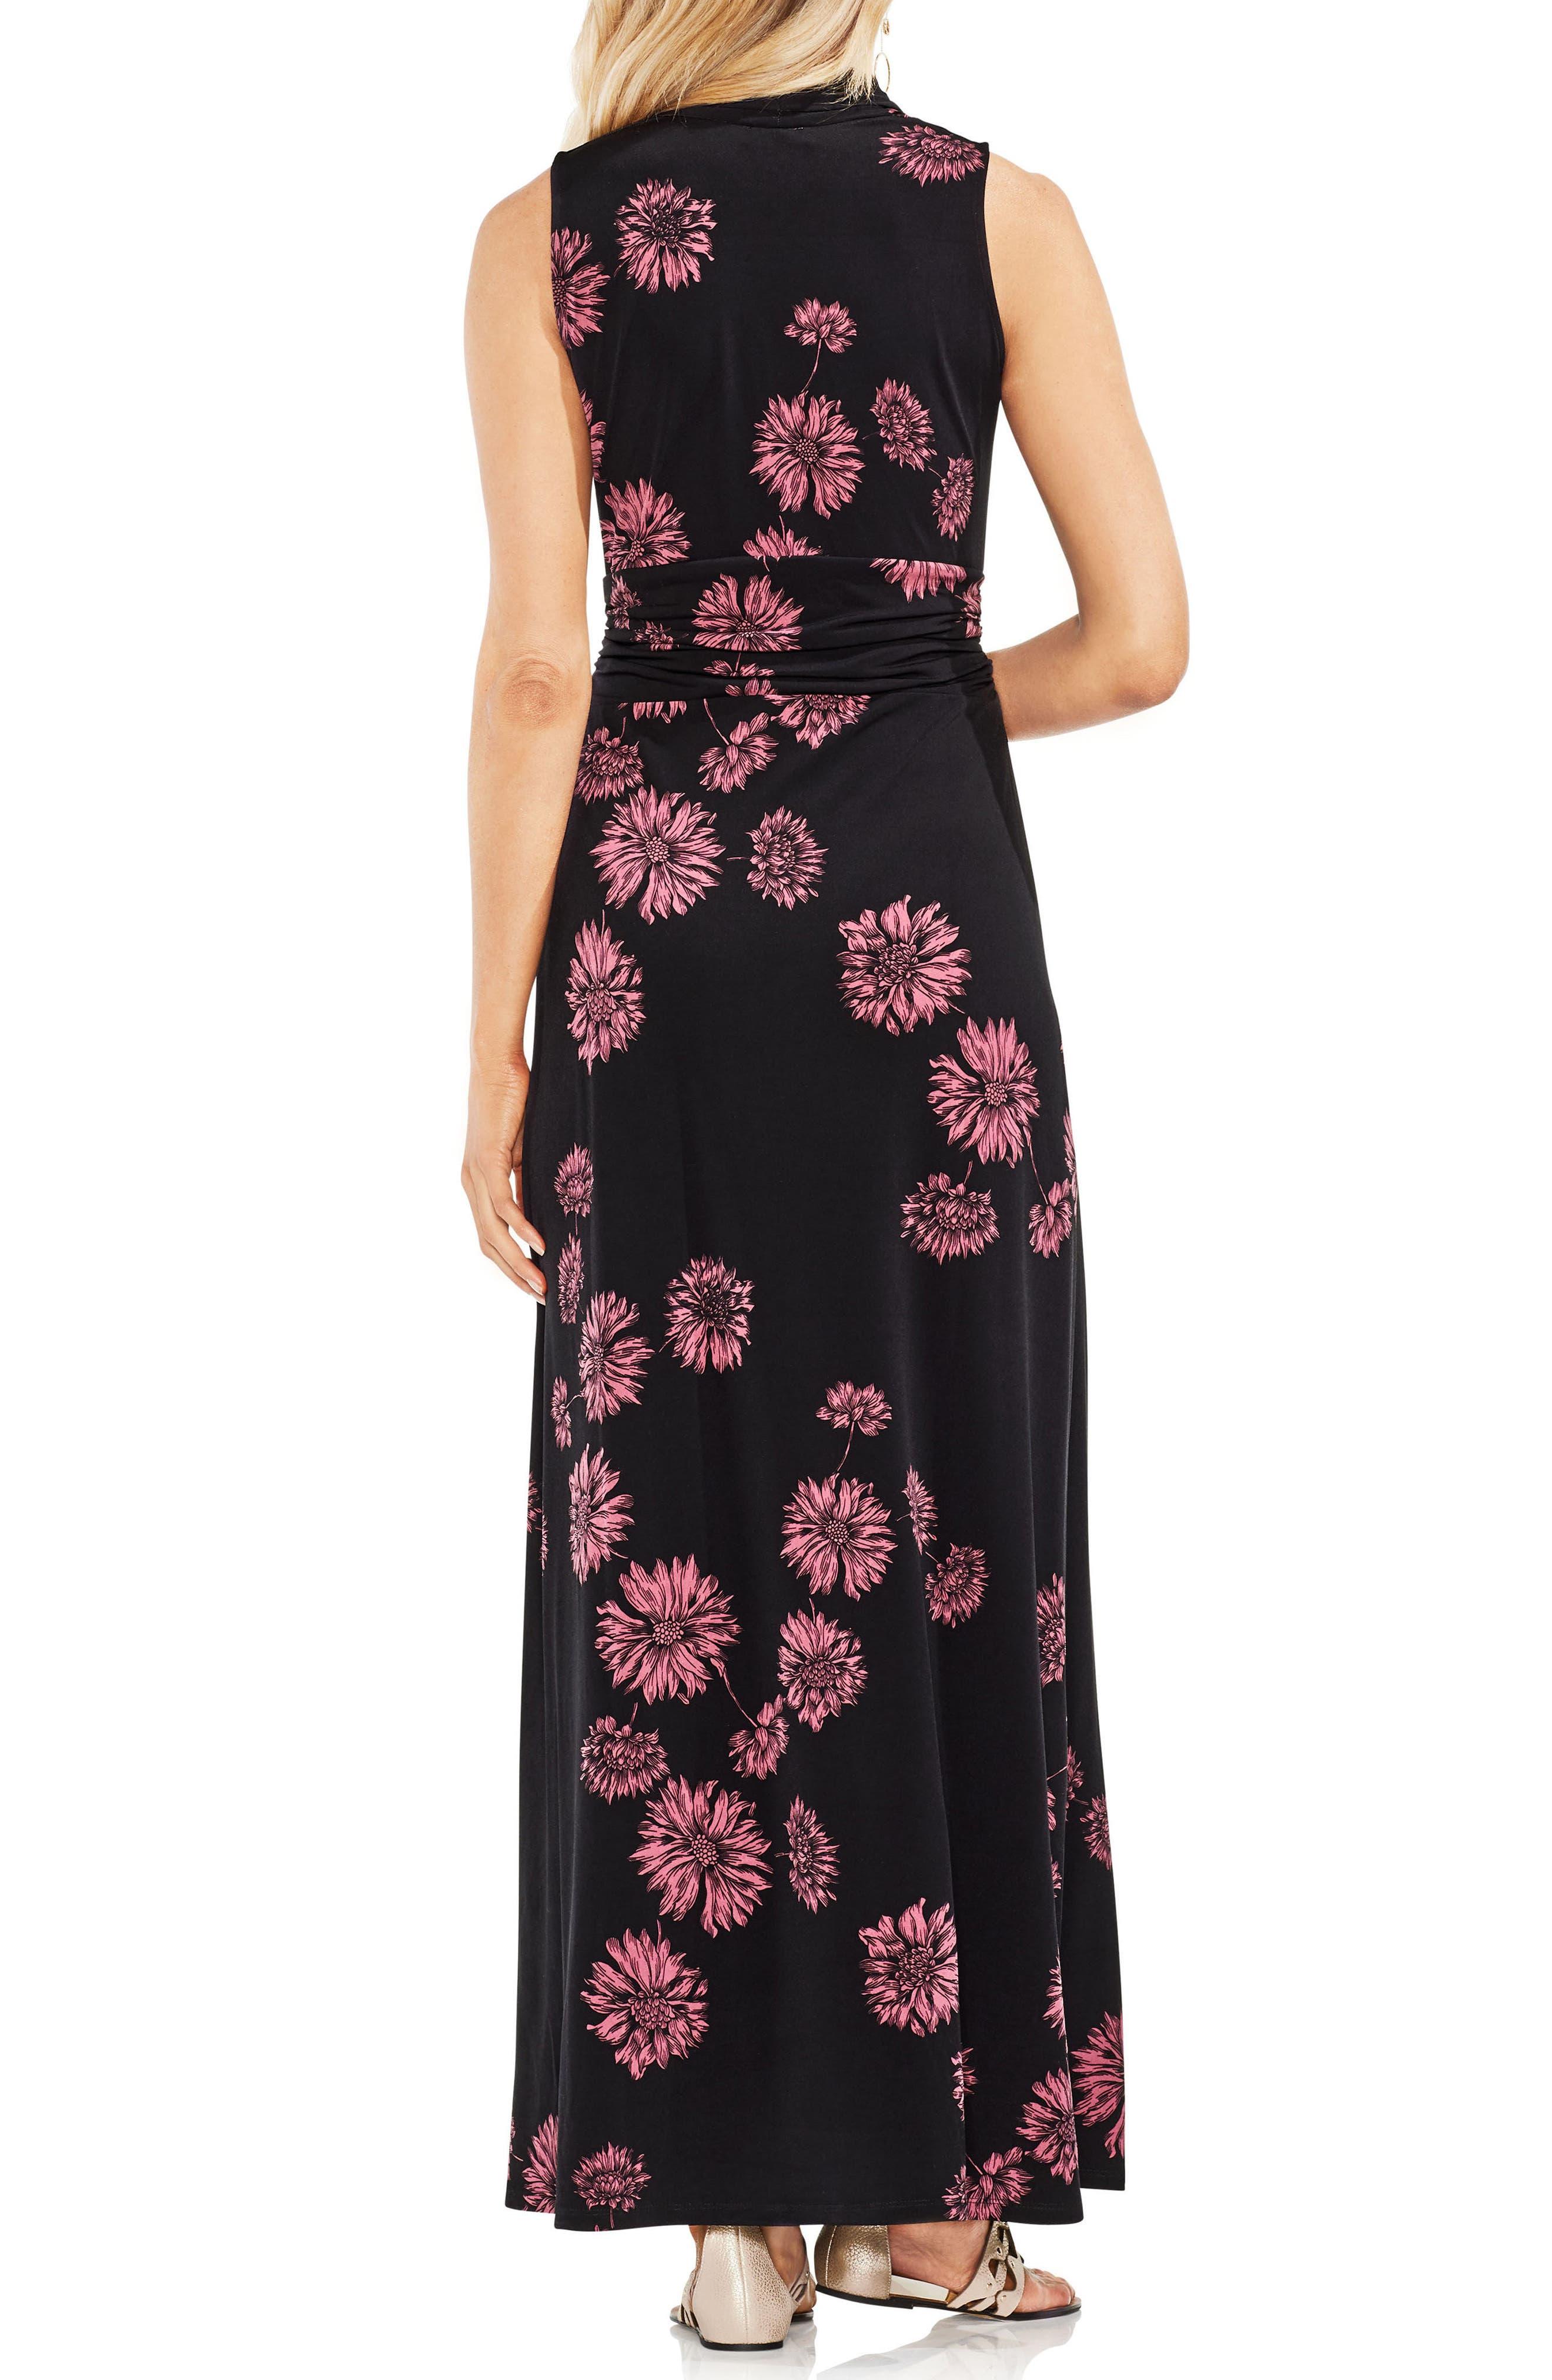 Chateau Floral Halter Maxi Dress,                             Alternate thumbnail 3, color,